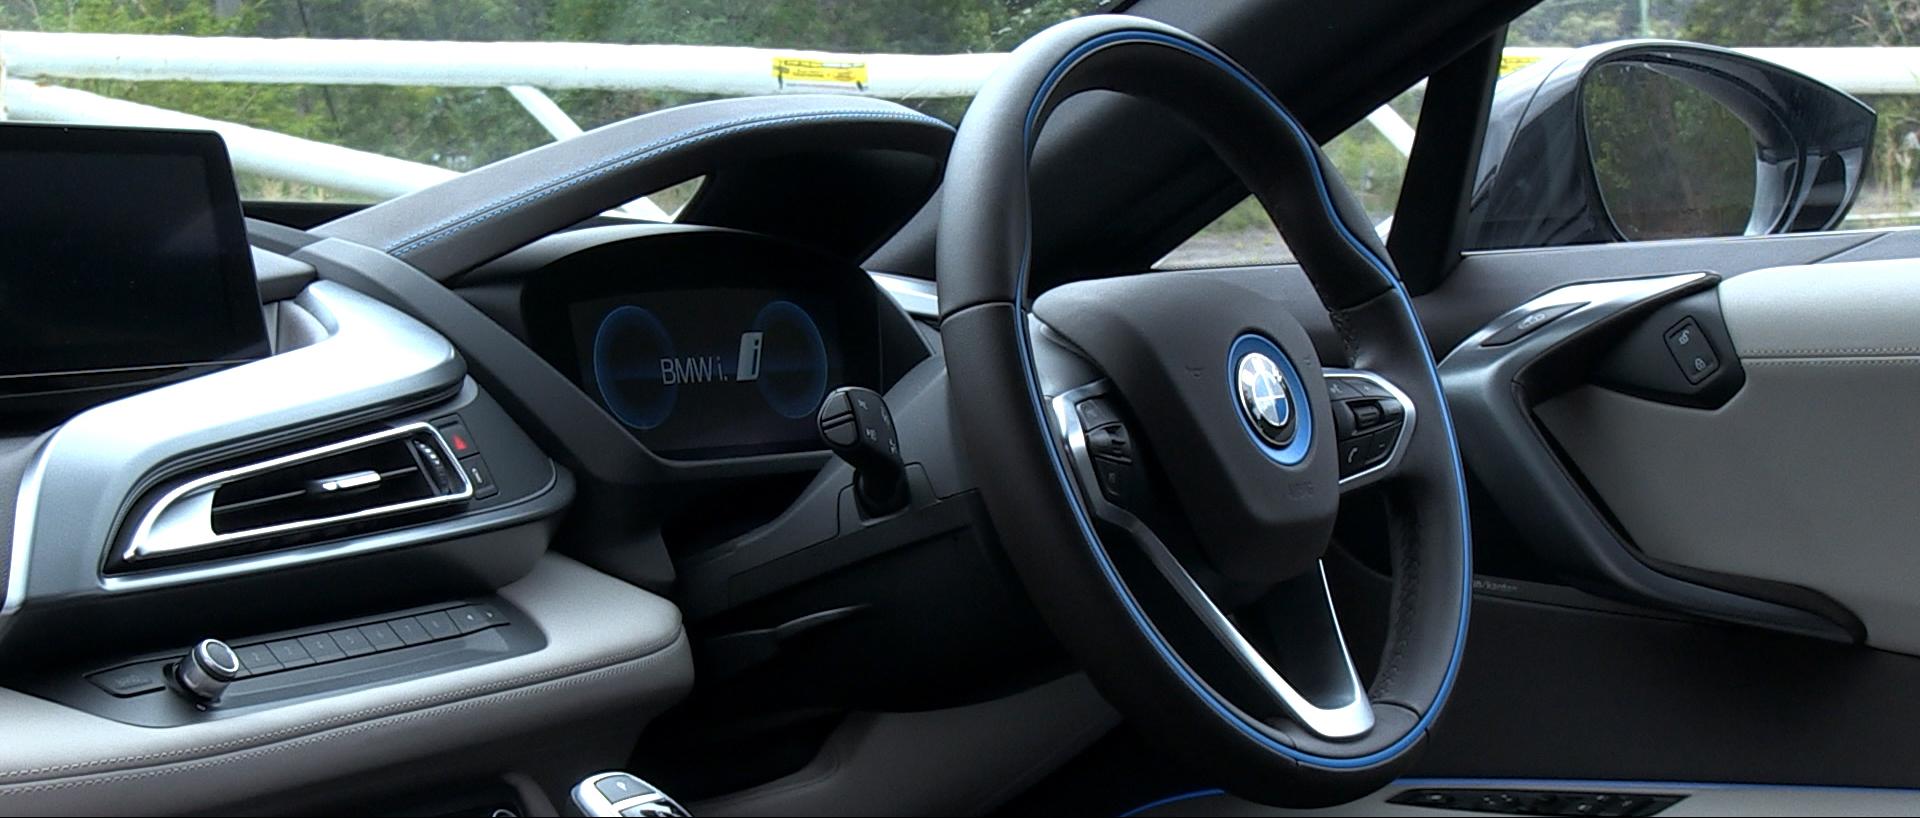 BMW i8 23.jpg